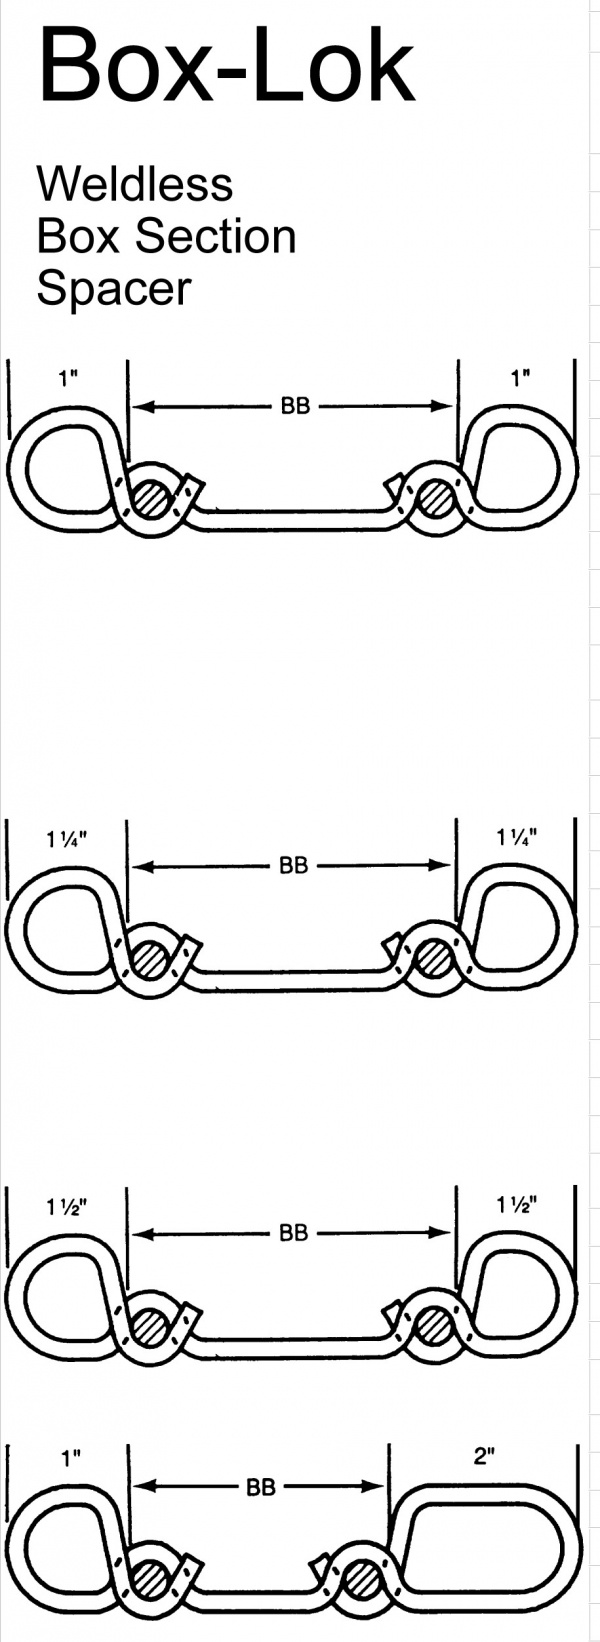 Box-Lok spacer dimensions